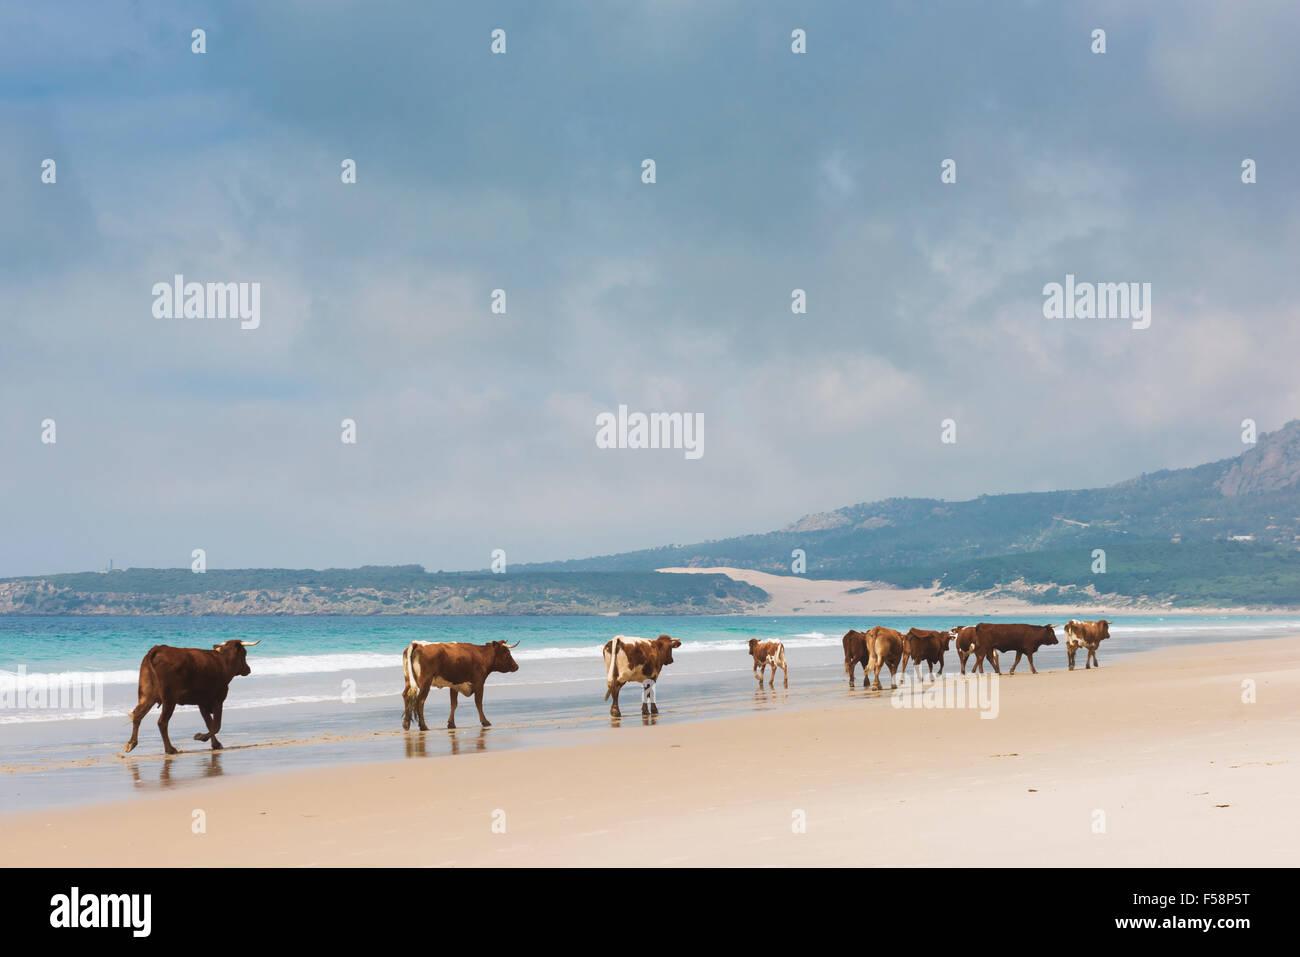 Group of cows walking along the beach. Bolonia, Tarifa, Costa de la Luz, Andalusia, Southern Spain. - Stock Image